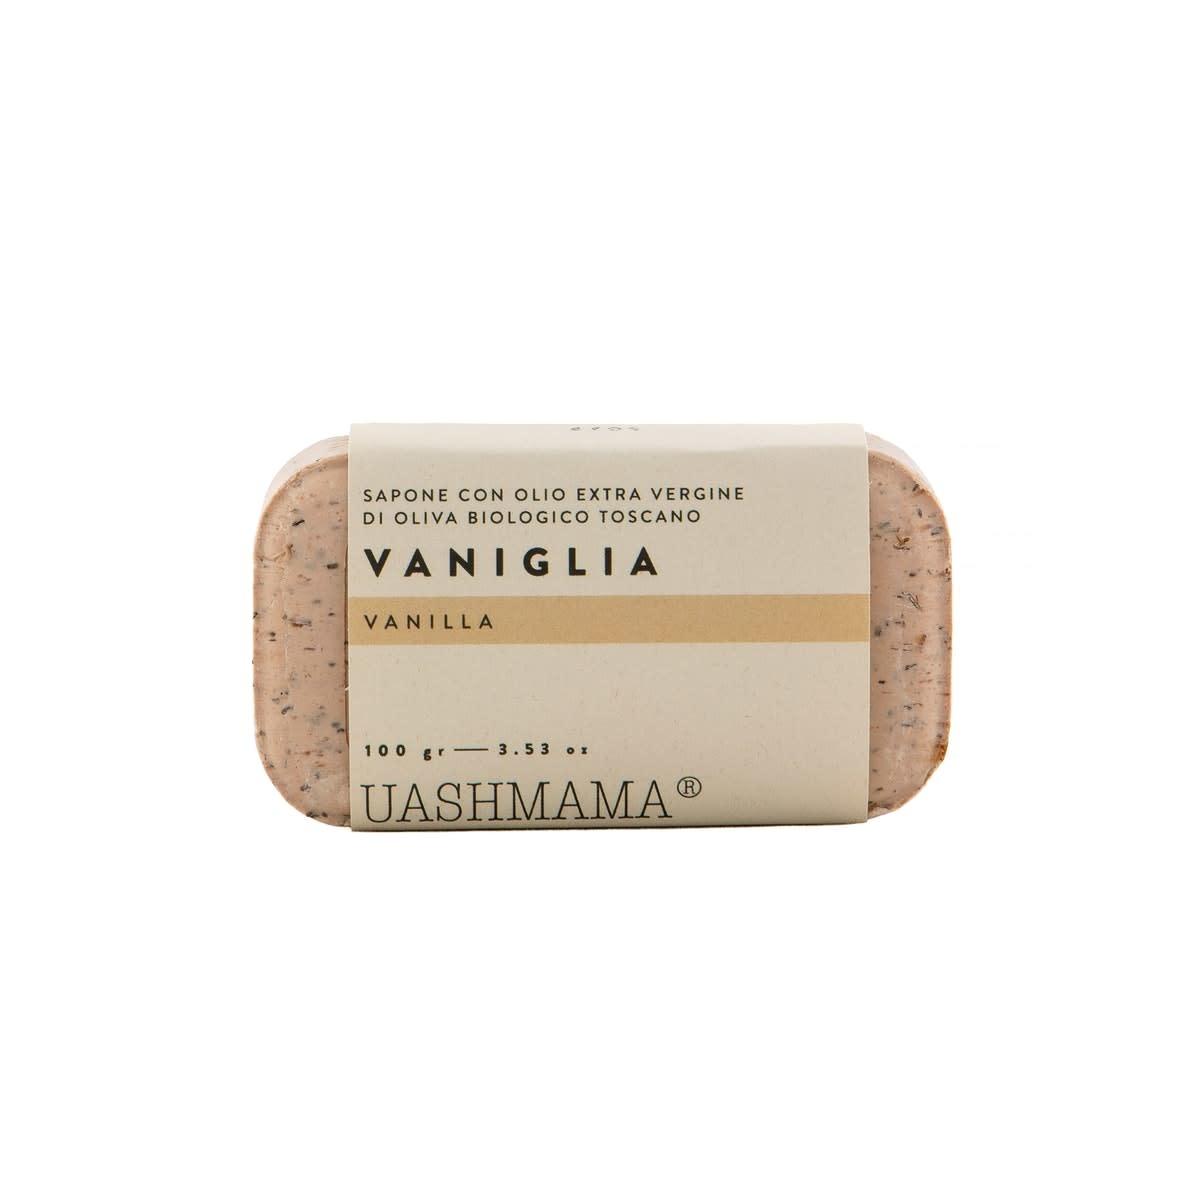 UASHMAMA SOAP VANIGLIA